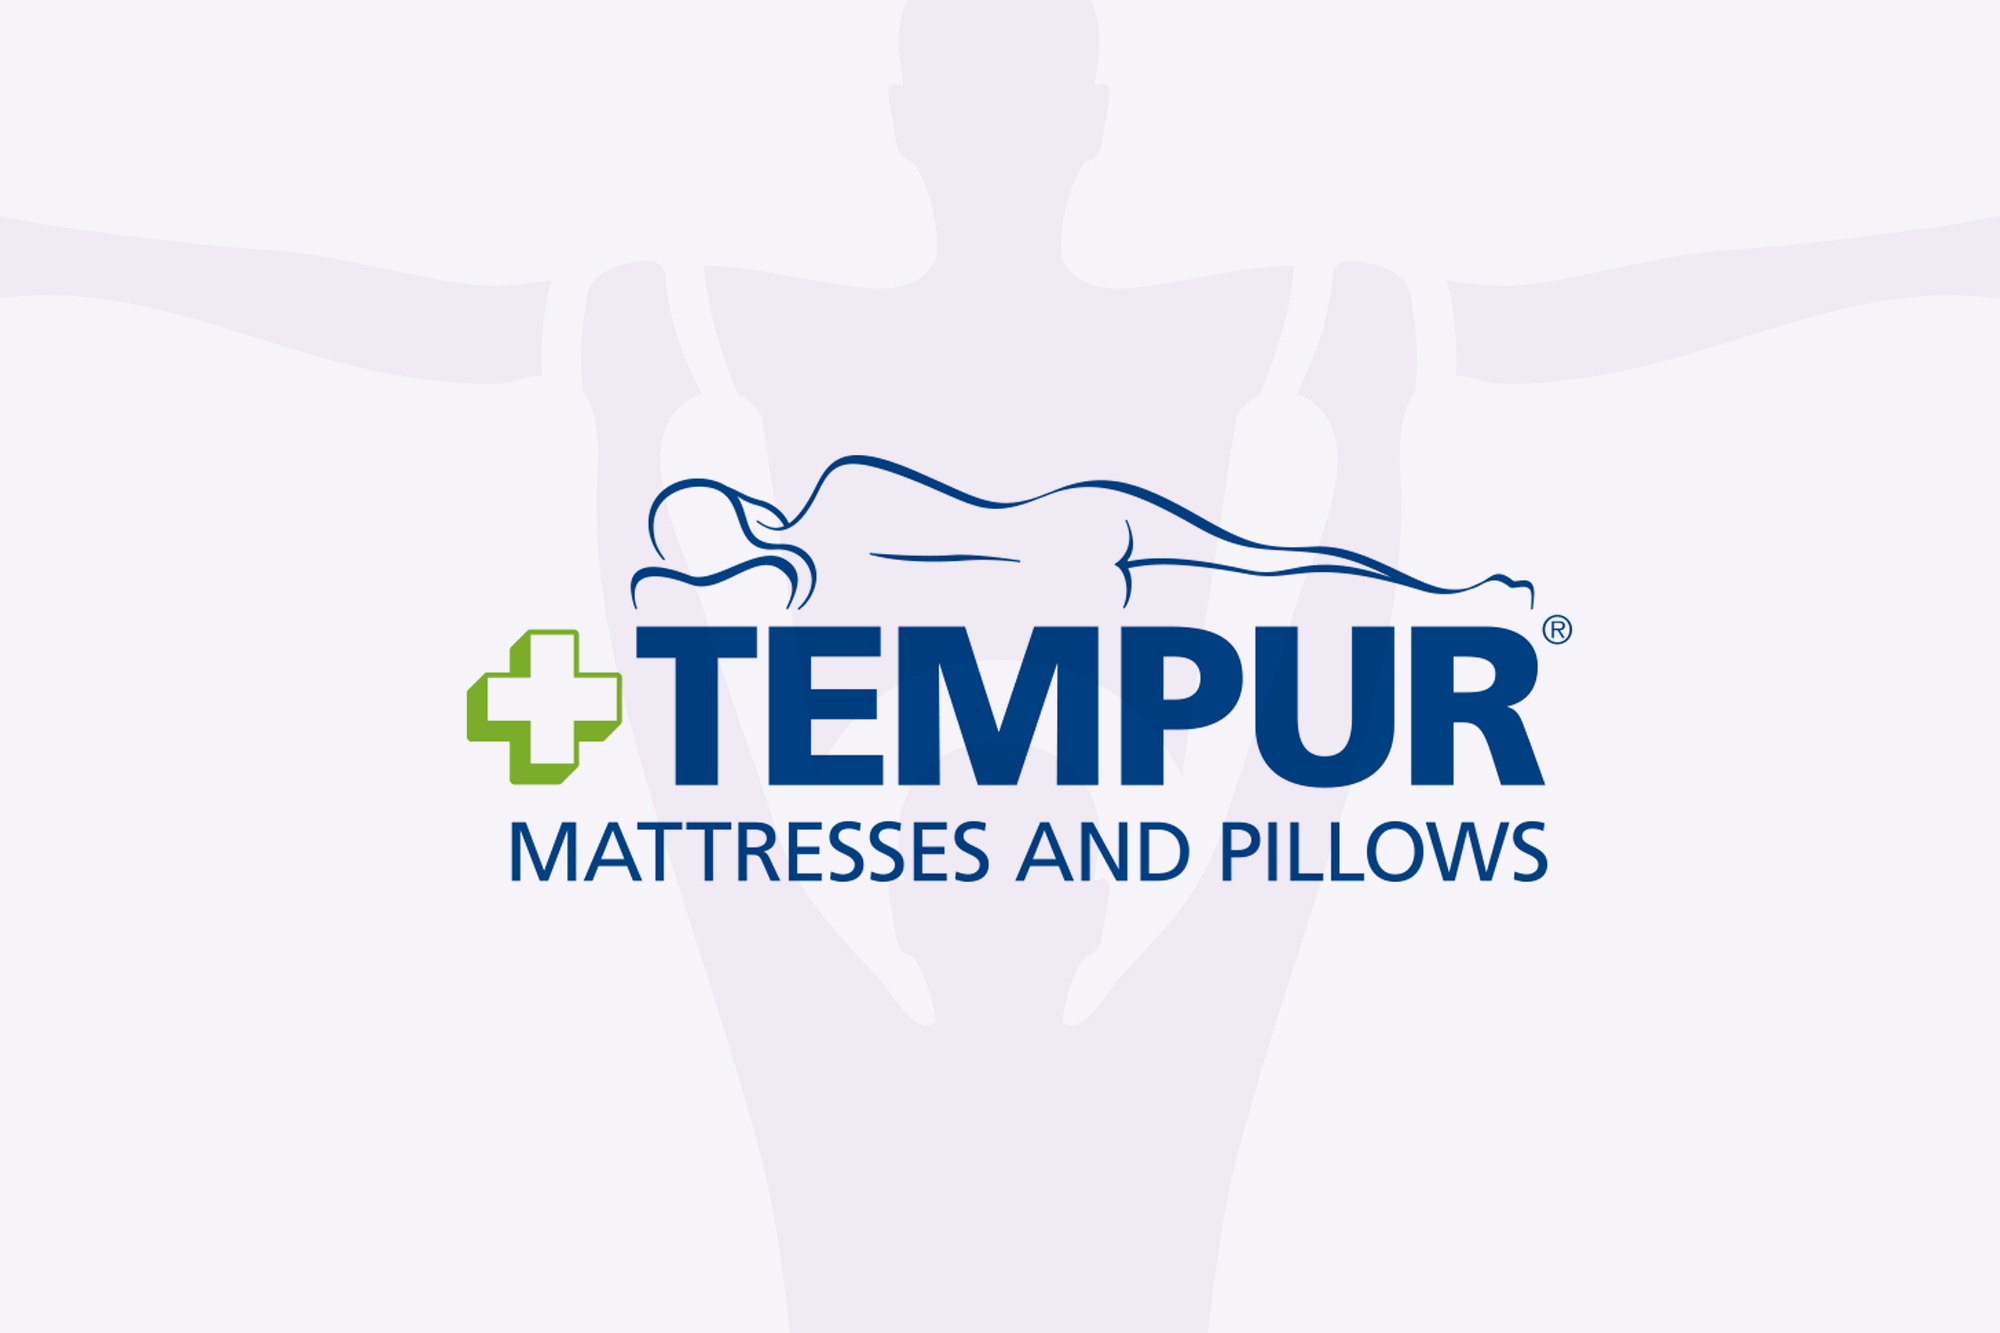 tempur company logo